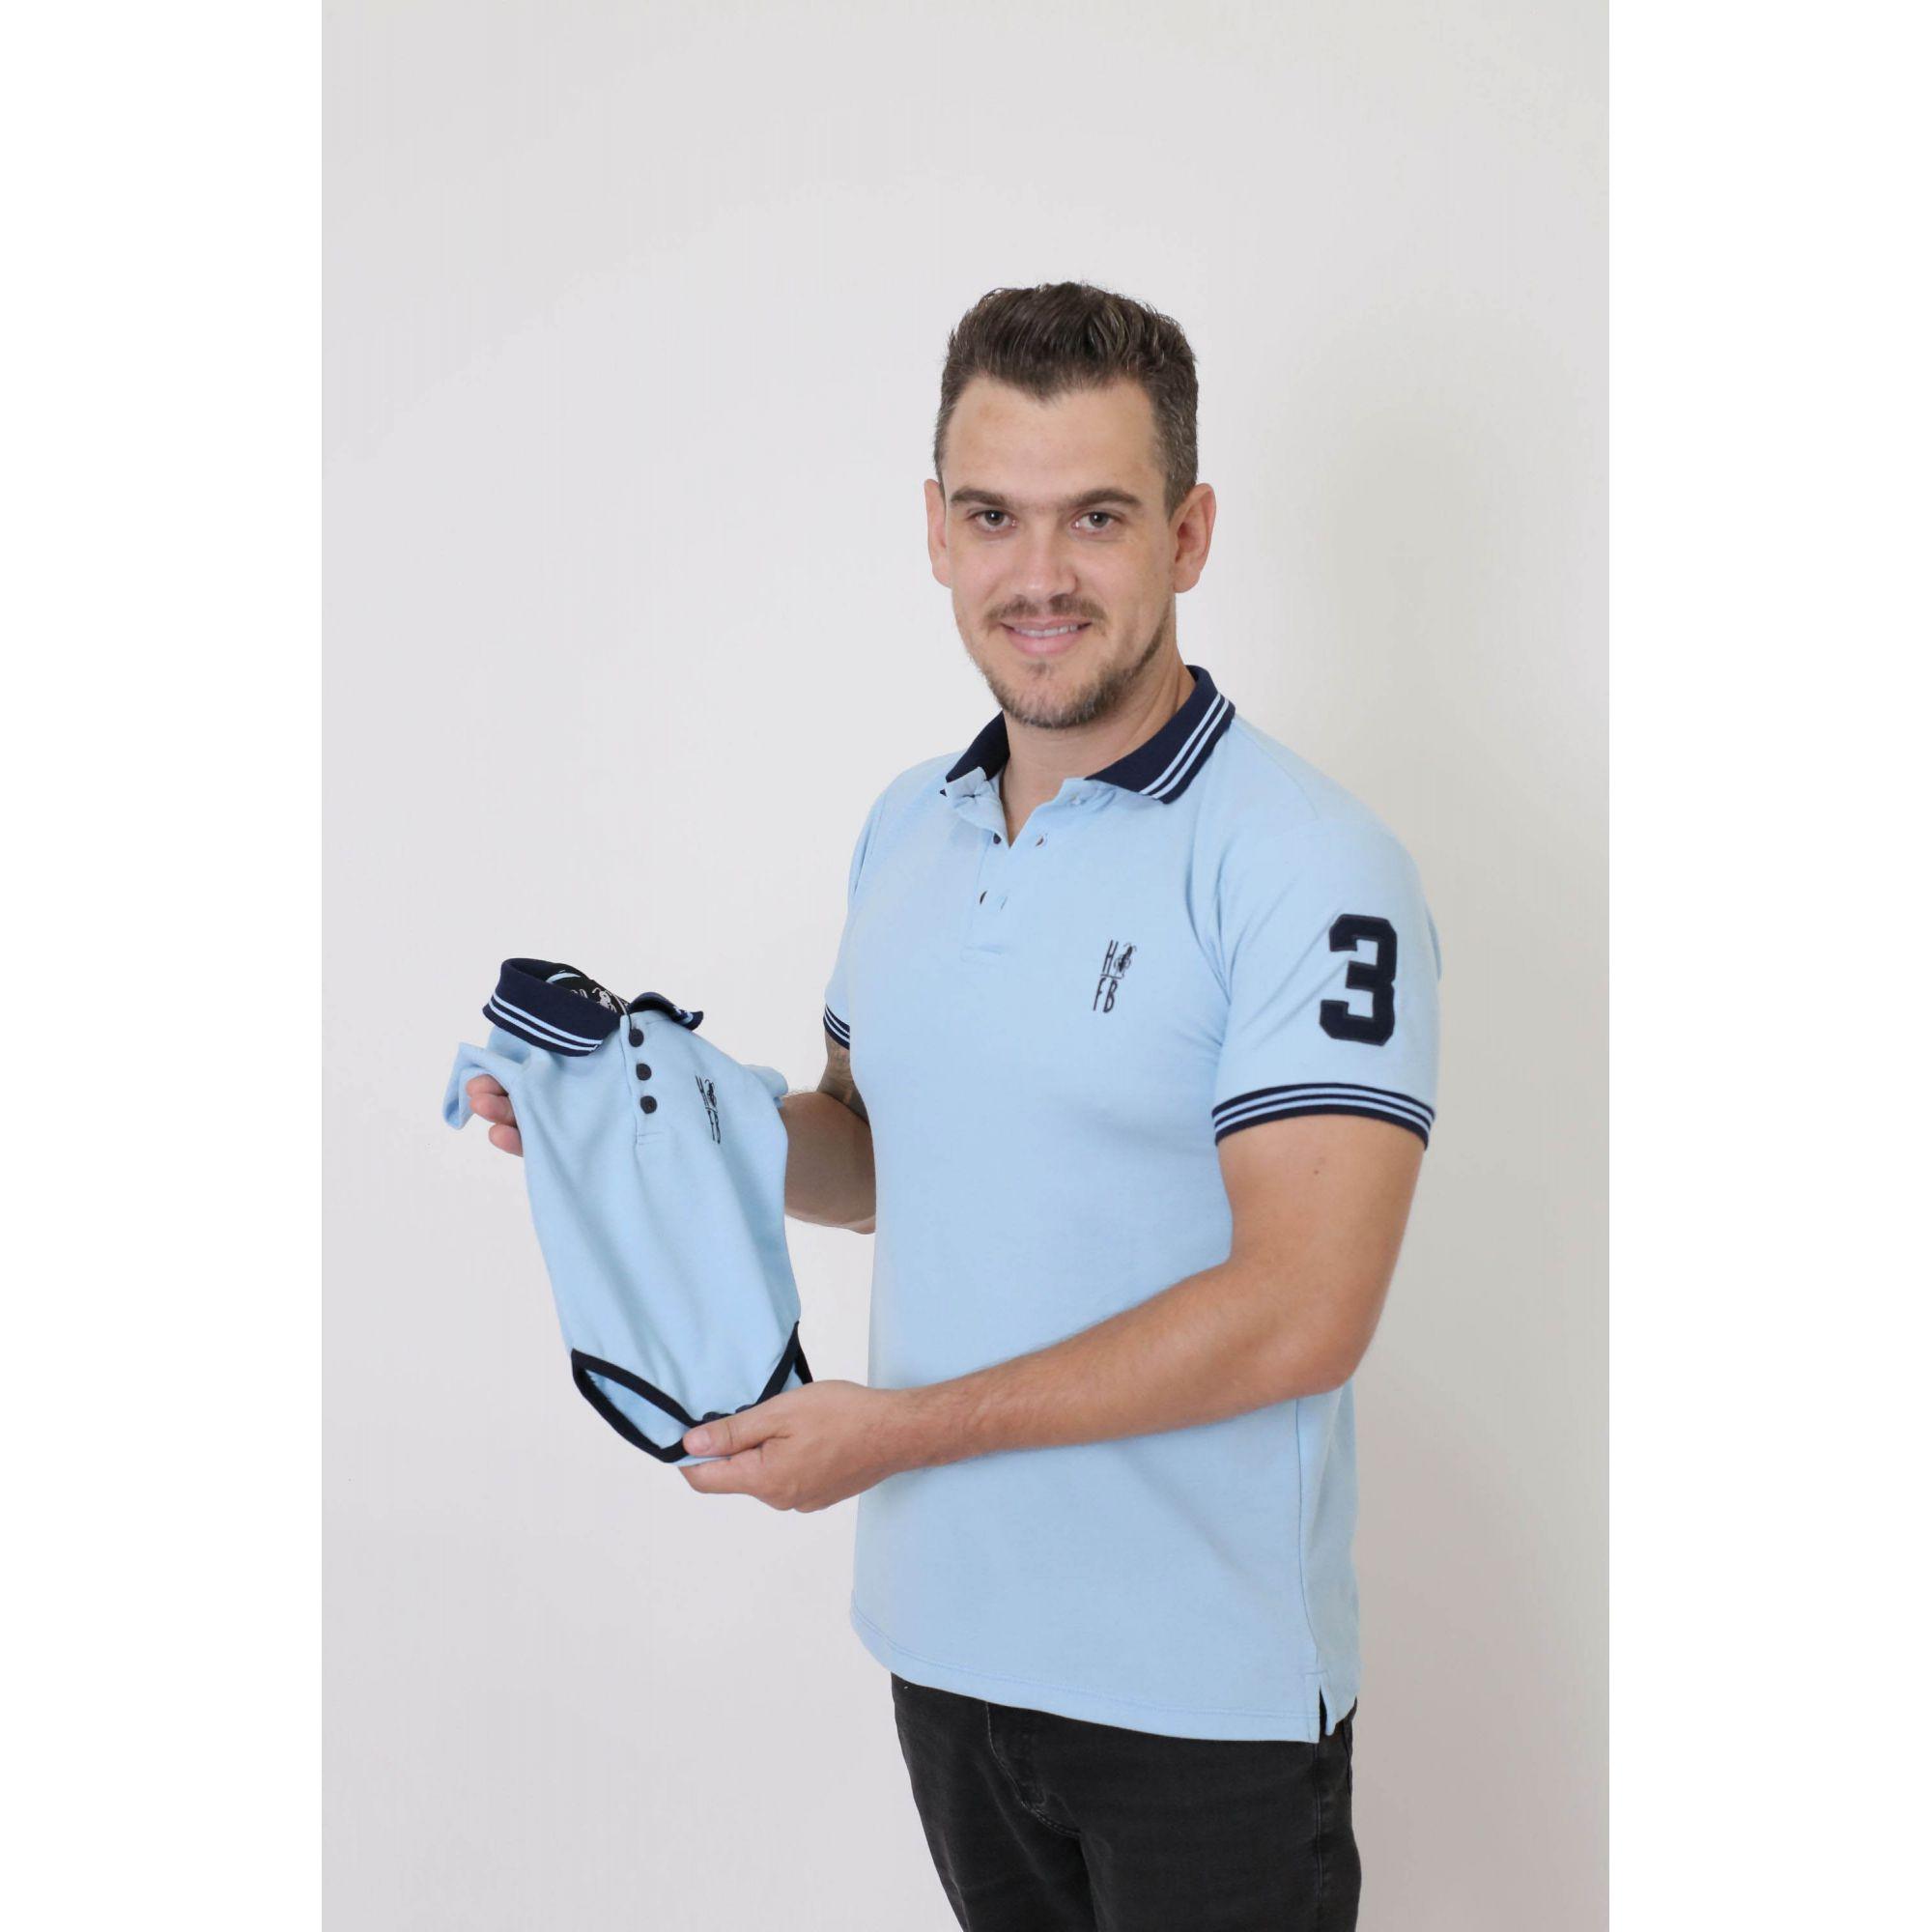 PAI E FILHO > Kit 02 Camisas ou Body Polo Azul Nobreza [Coleção Tal Pai Tal Filho]  - Heitor Fashion Brazil